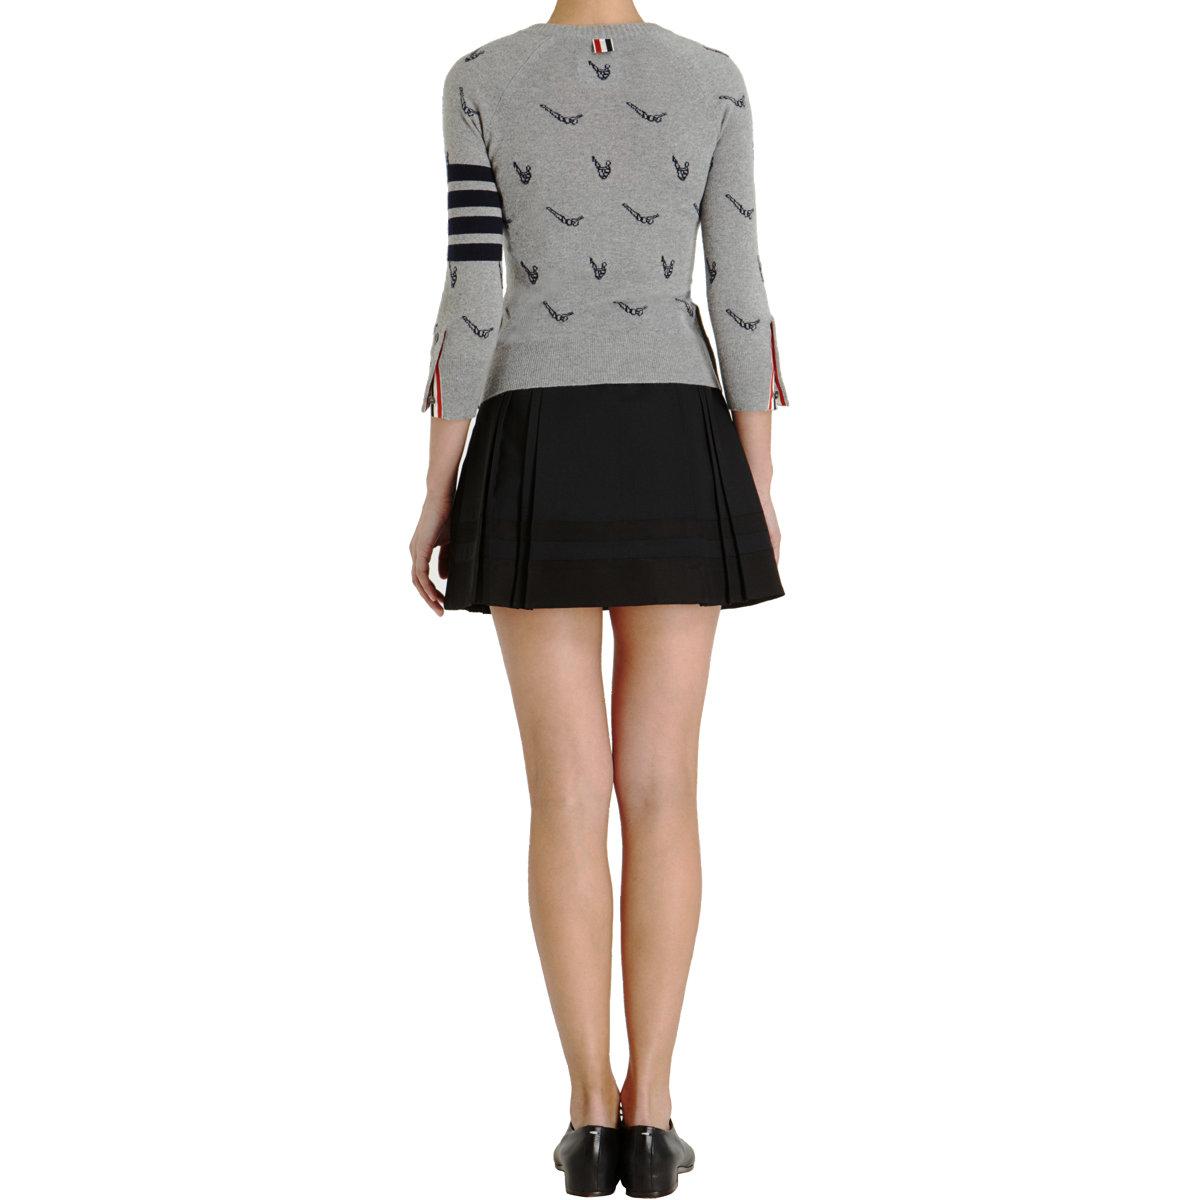 Thom Browne School Uniform Skirt in Black - Lyst